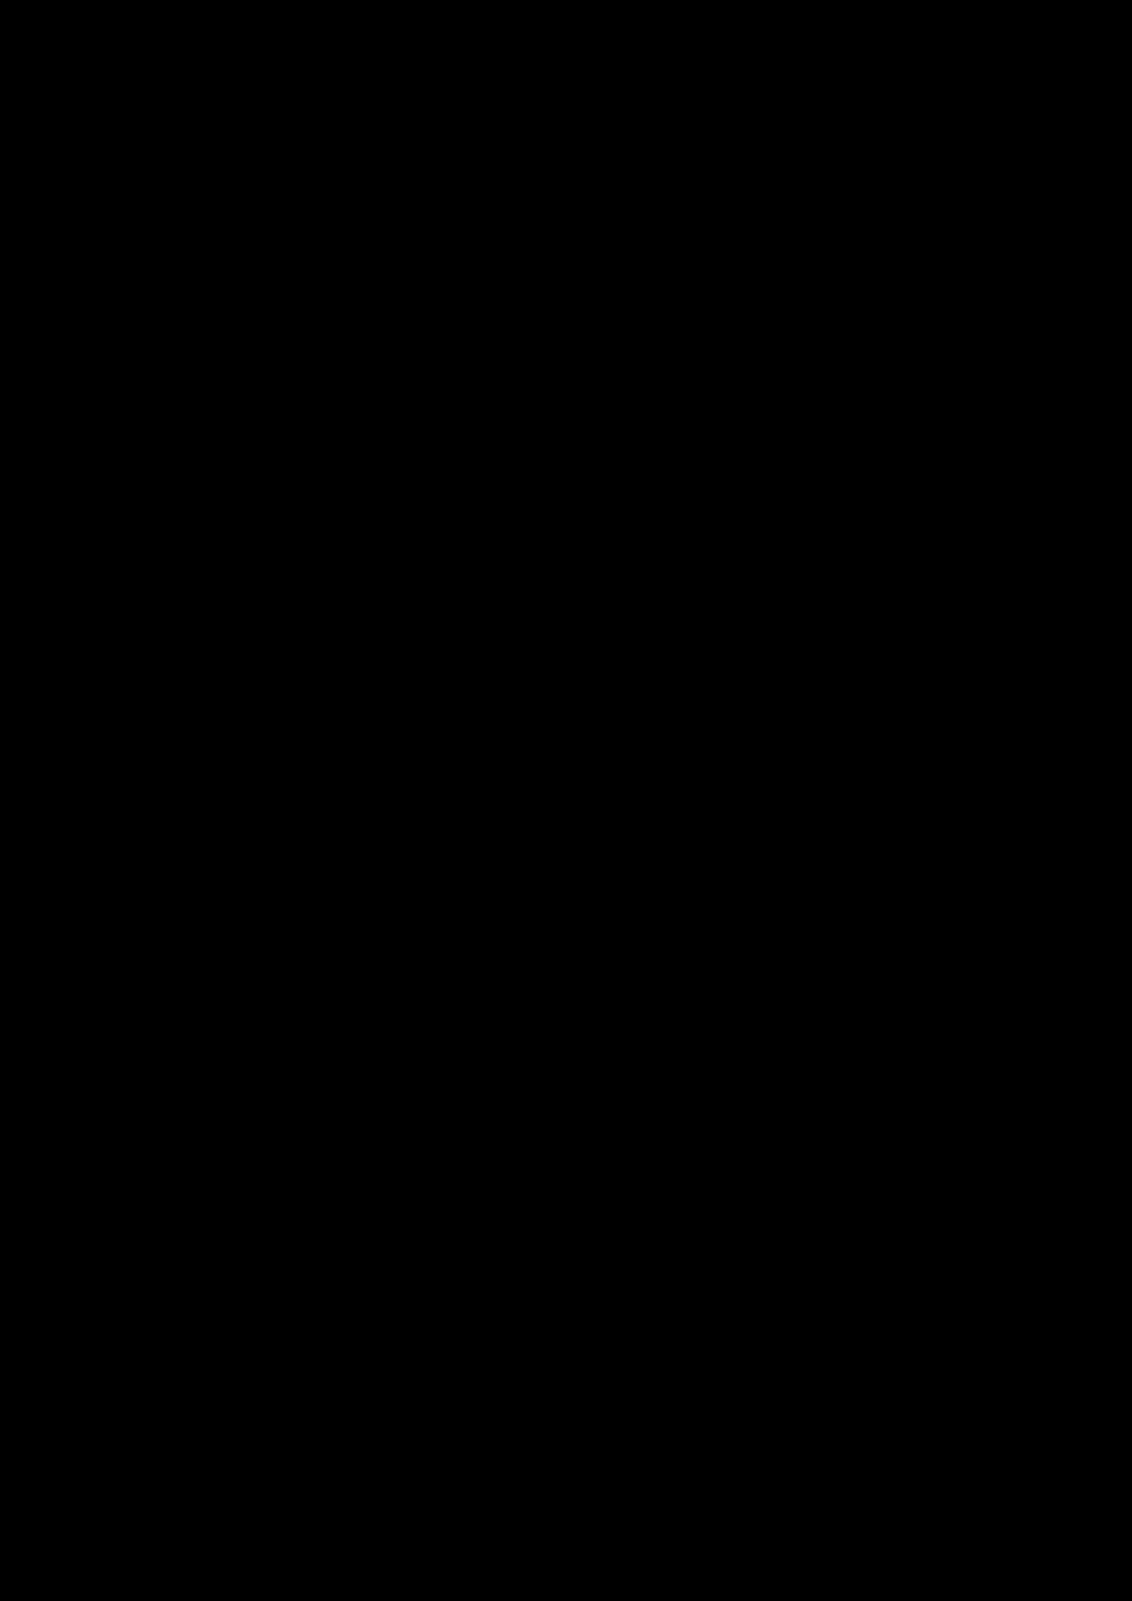 Mrs. Vandebilt slide, Image 56